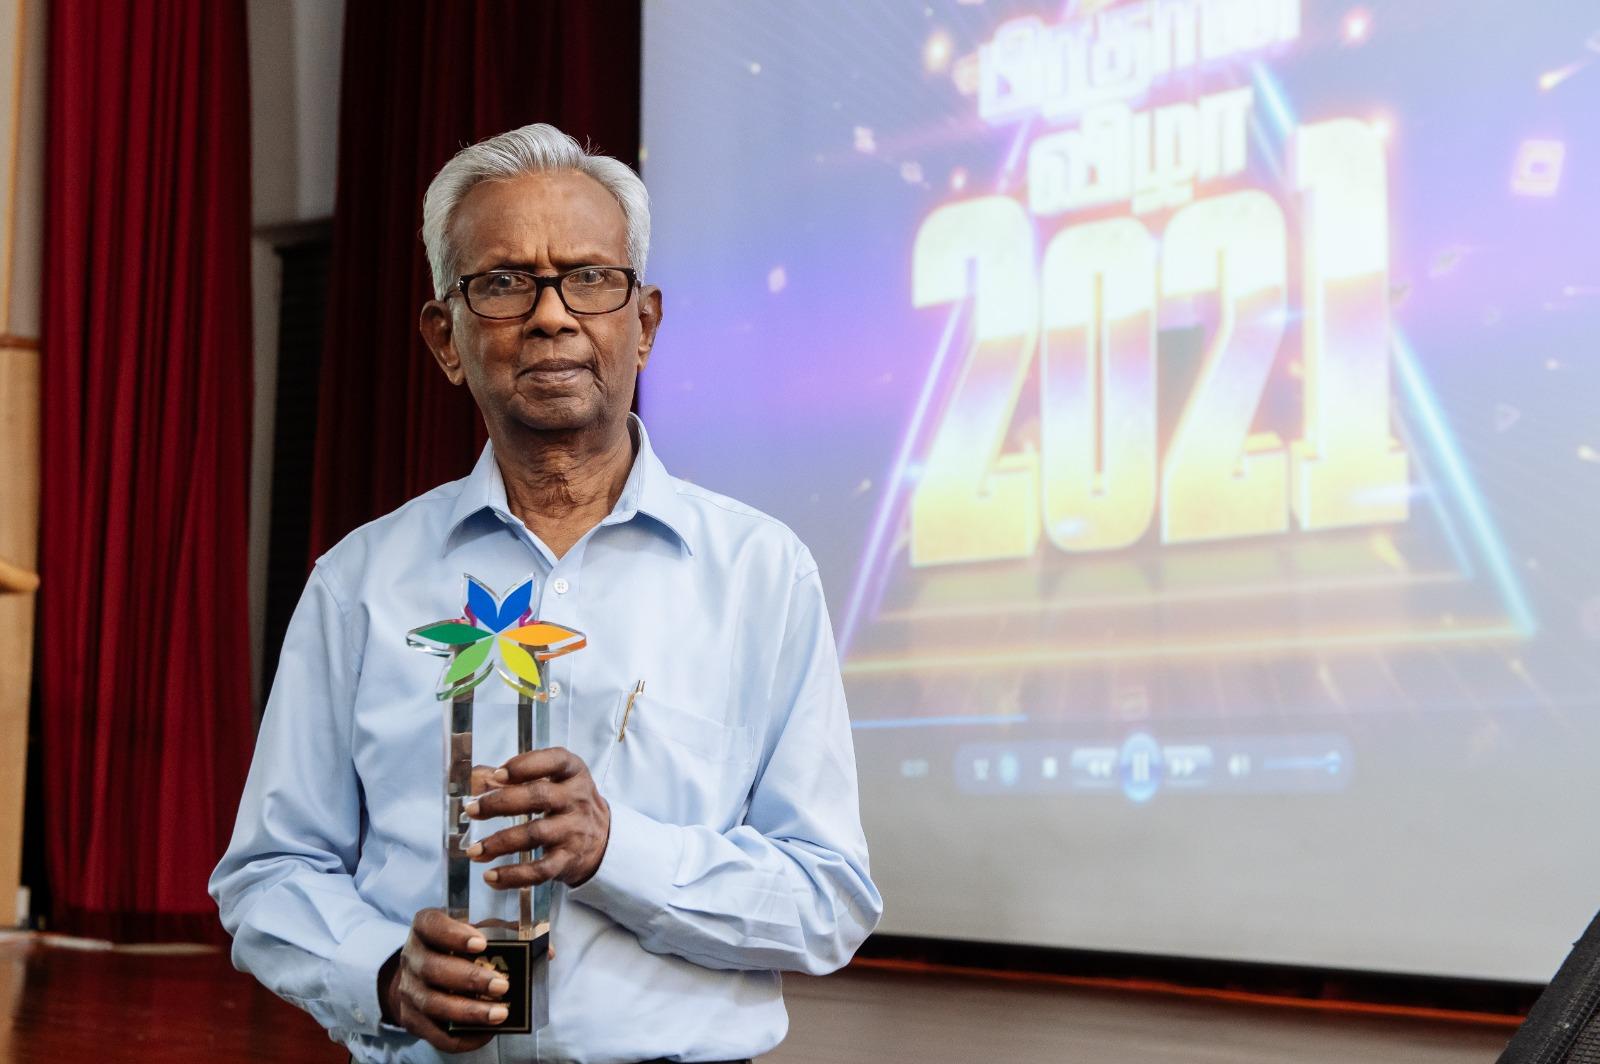 P Krishnan was conferred the Lifetime Achievement Award. Photo courtesy: Mediacorp